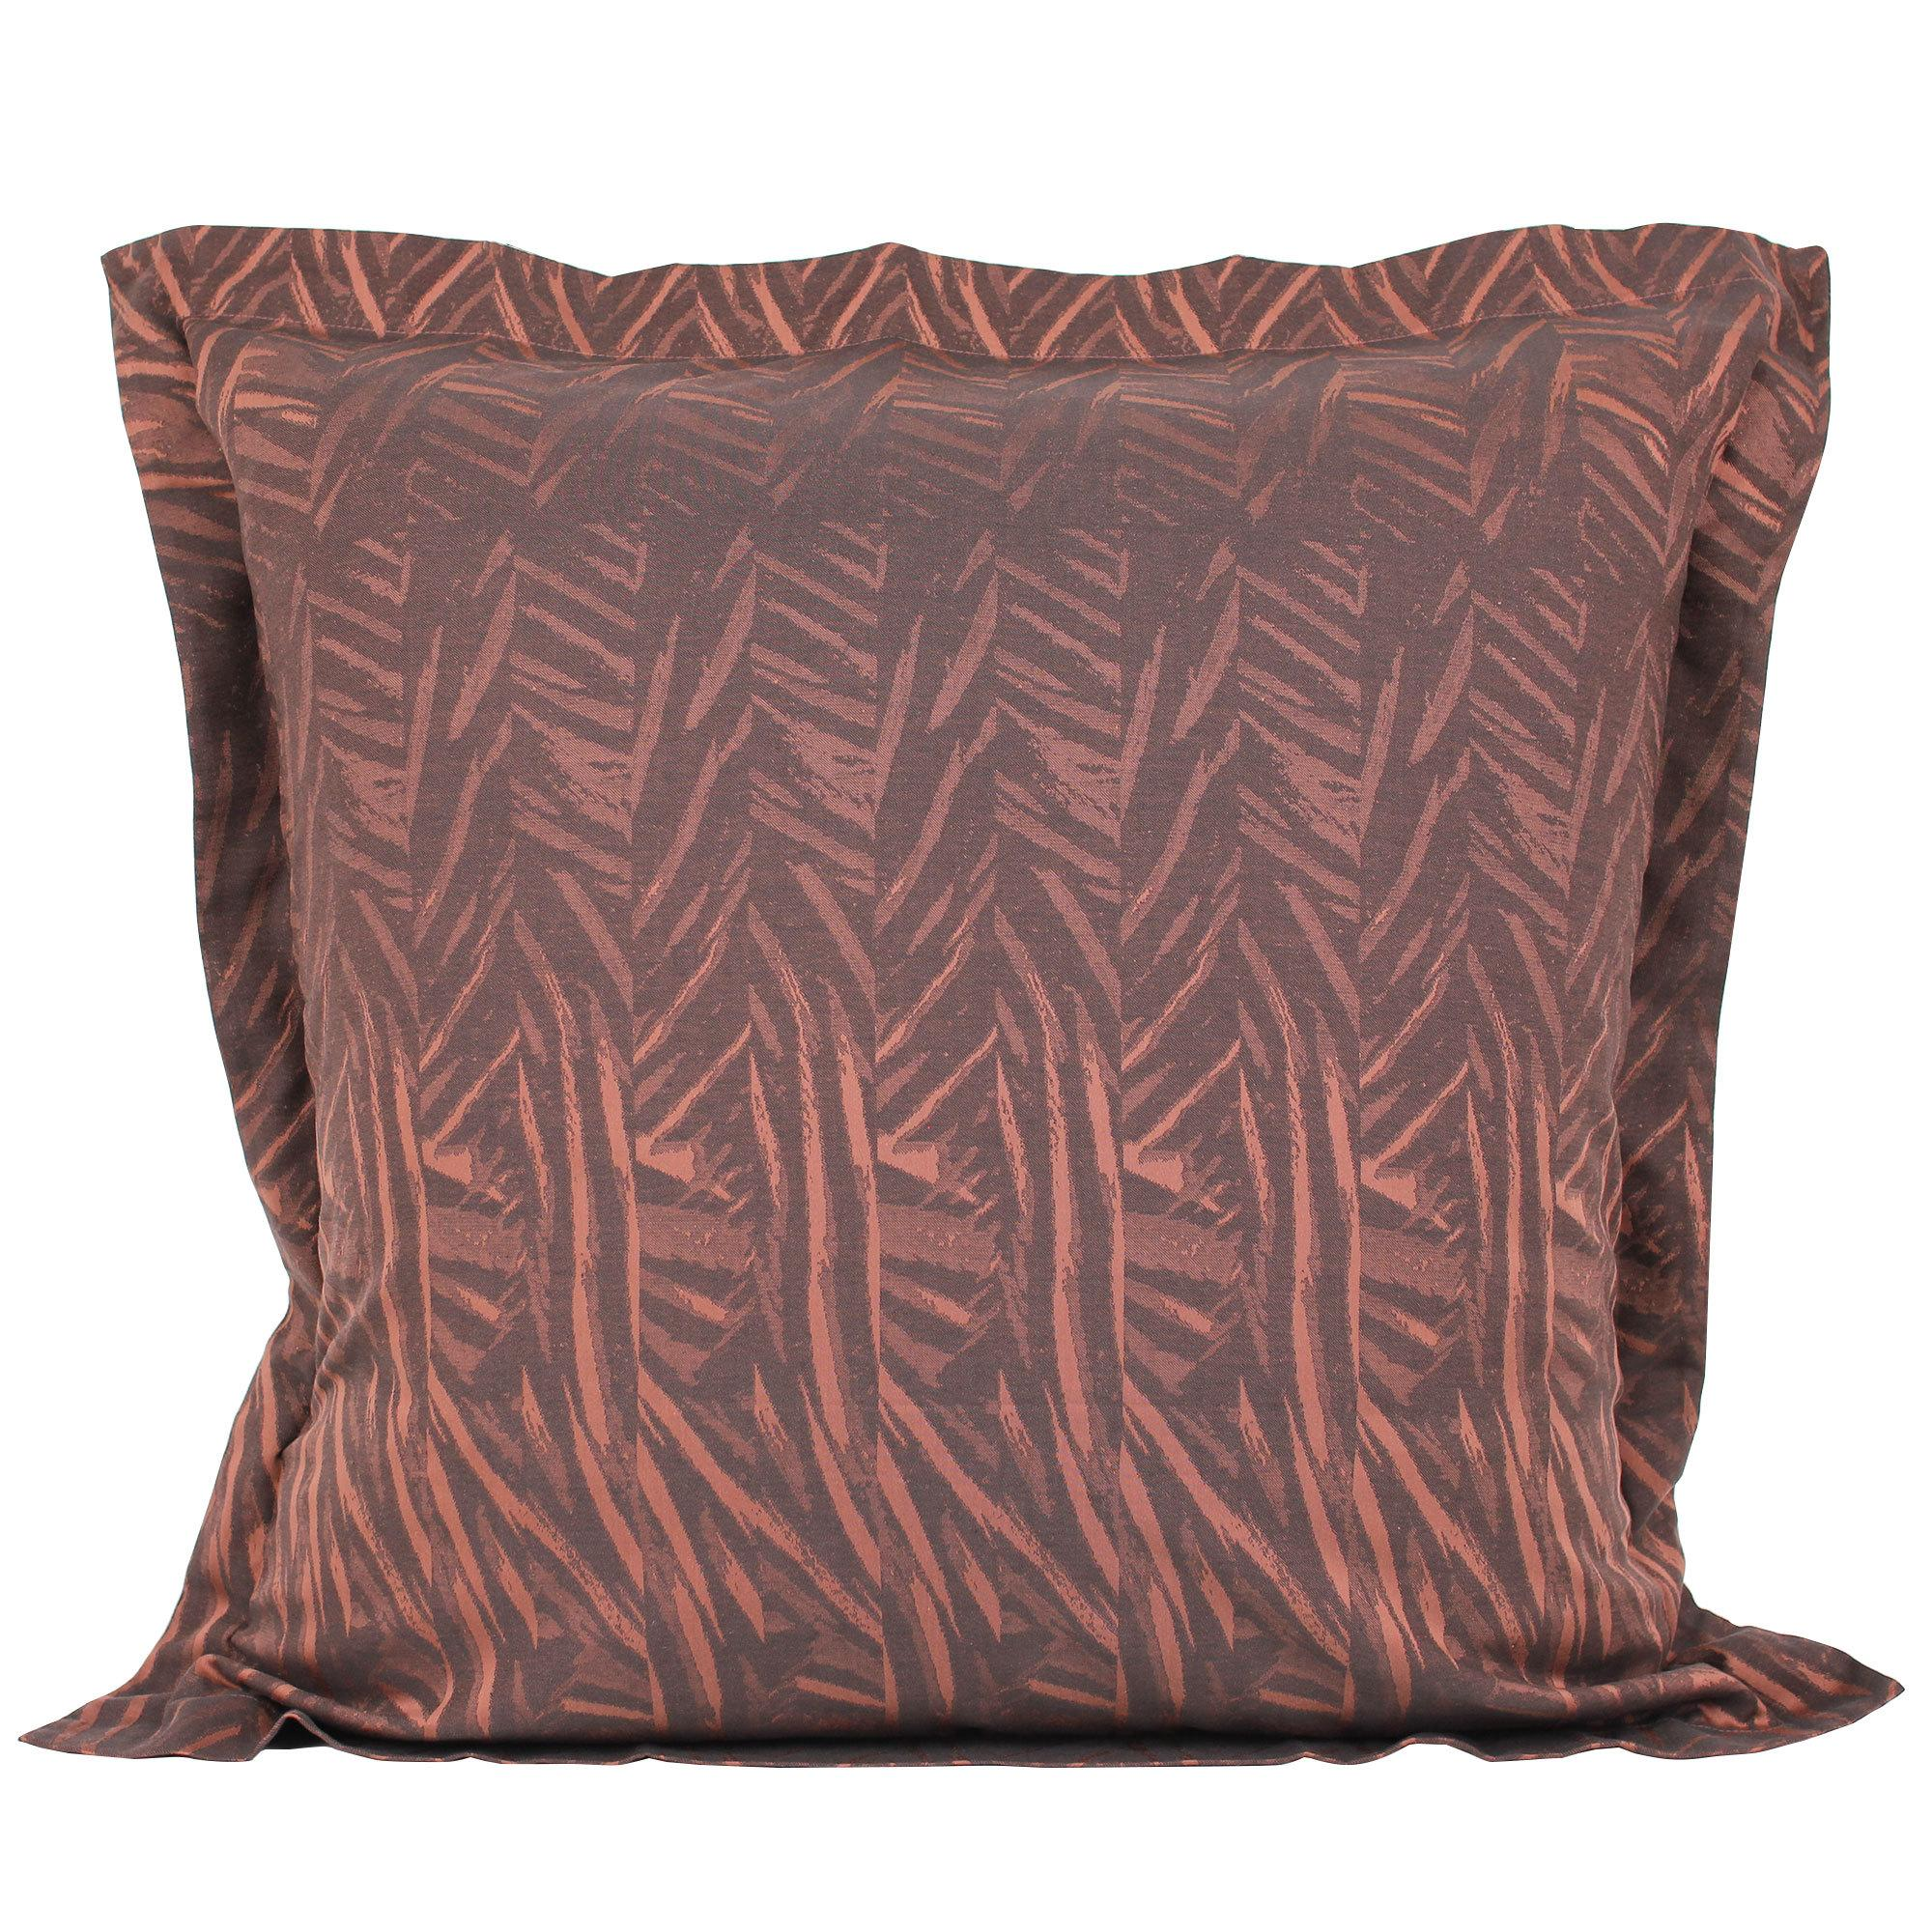 taie d 39 oreiller 65x65 satin de coton opera marron fonc ebay. Black Bedroom Furniture Sets. Home Design Ideas